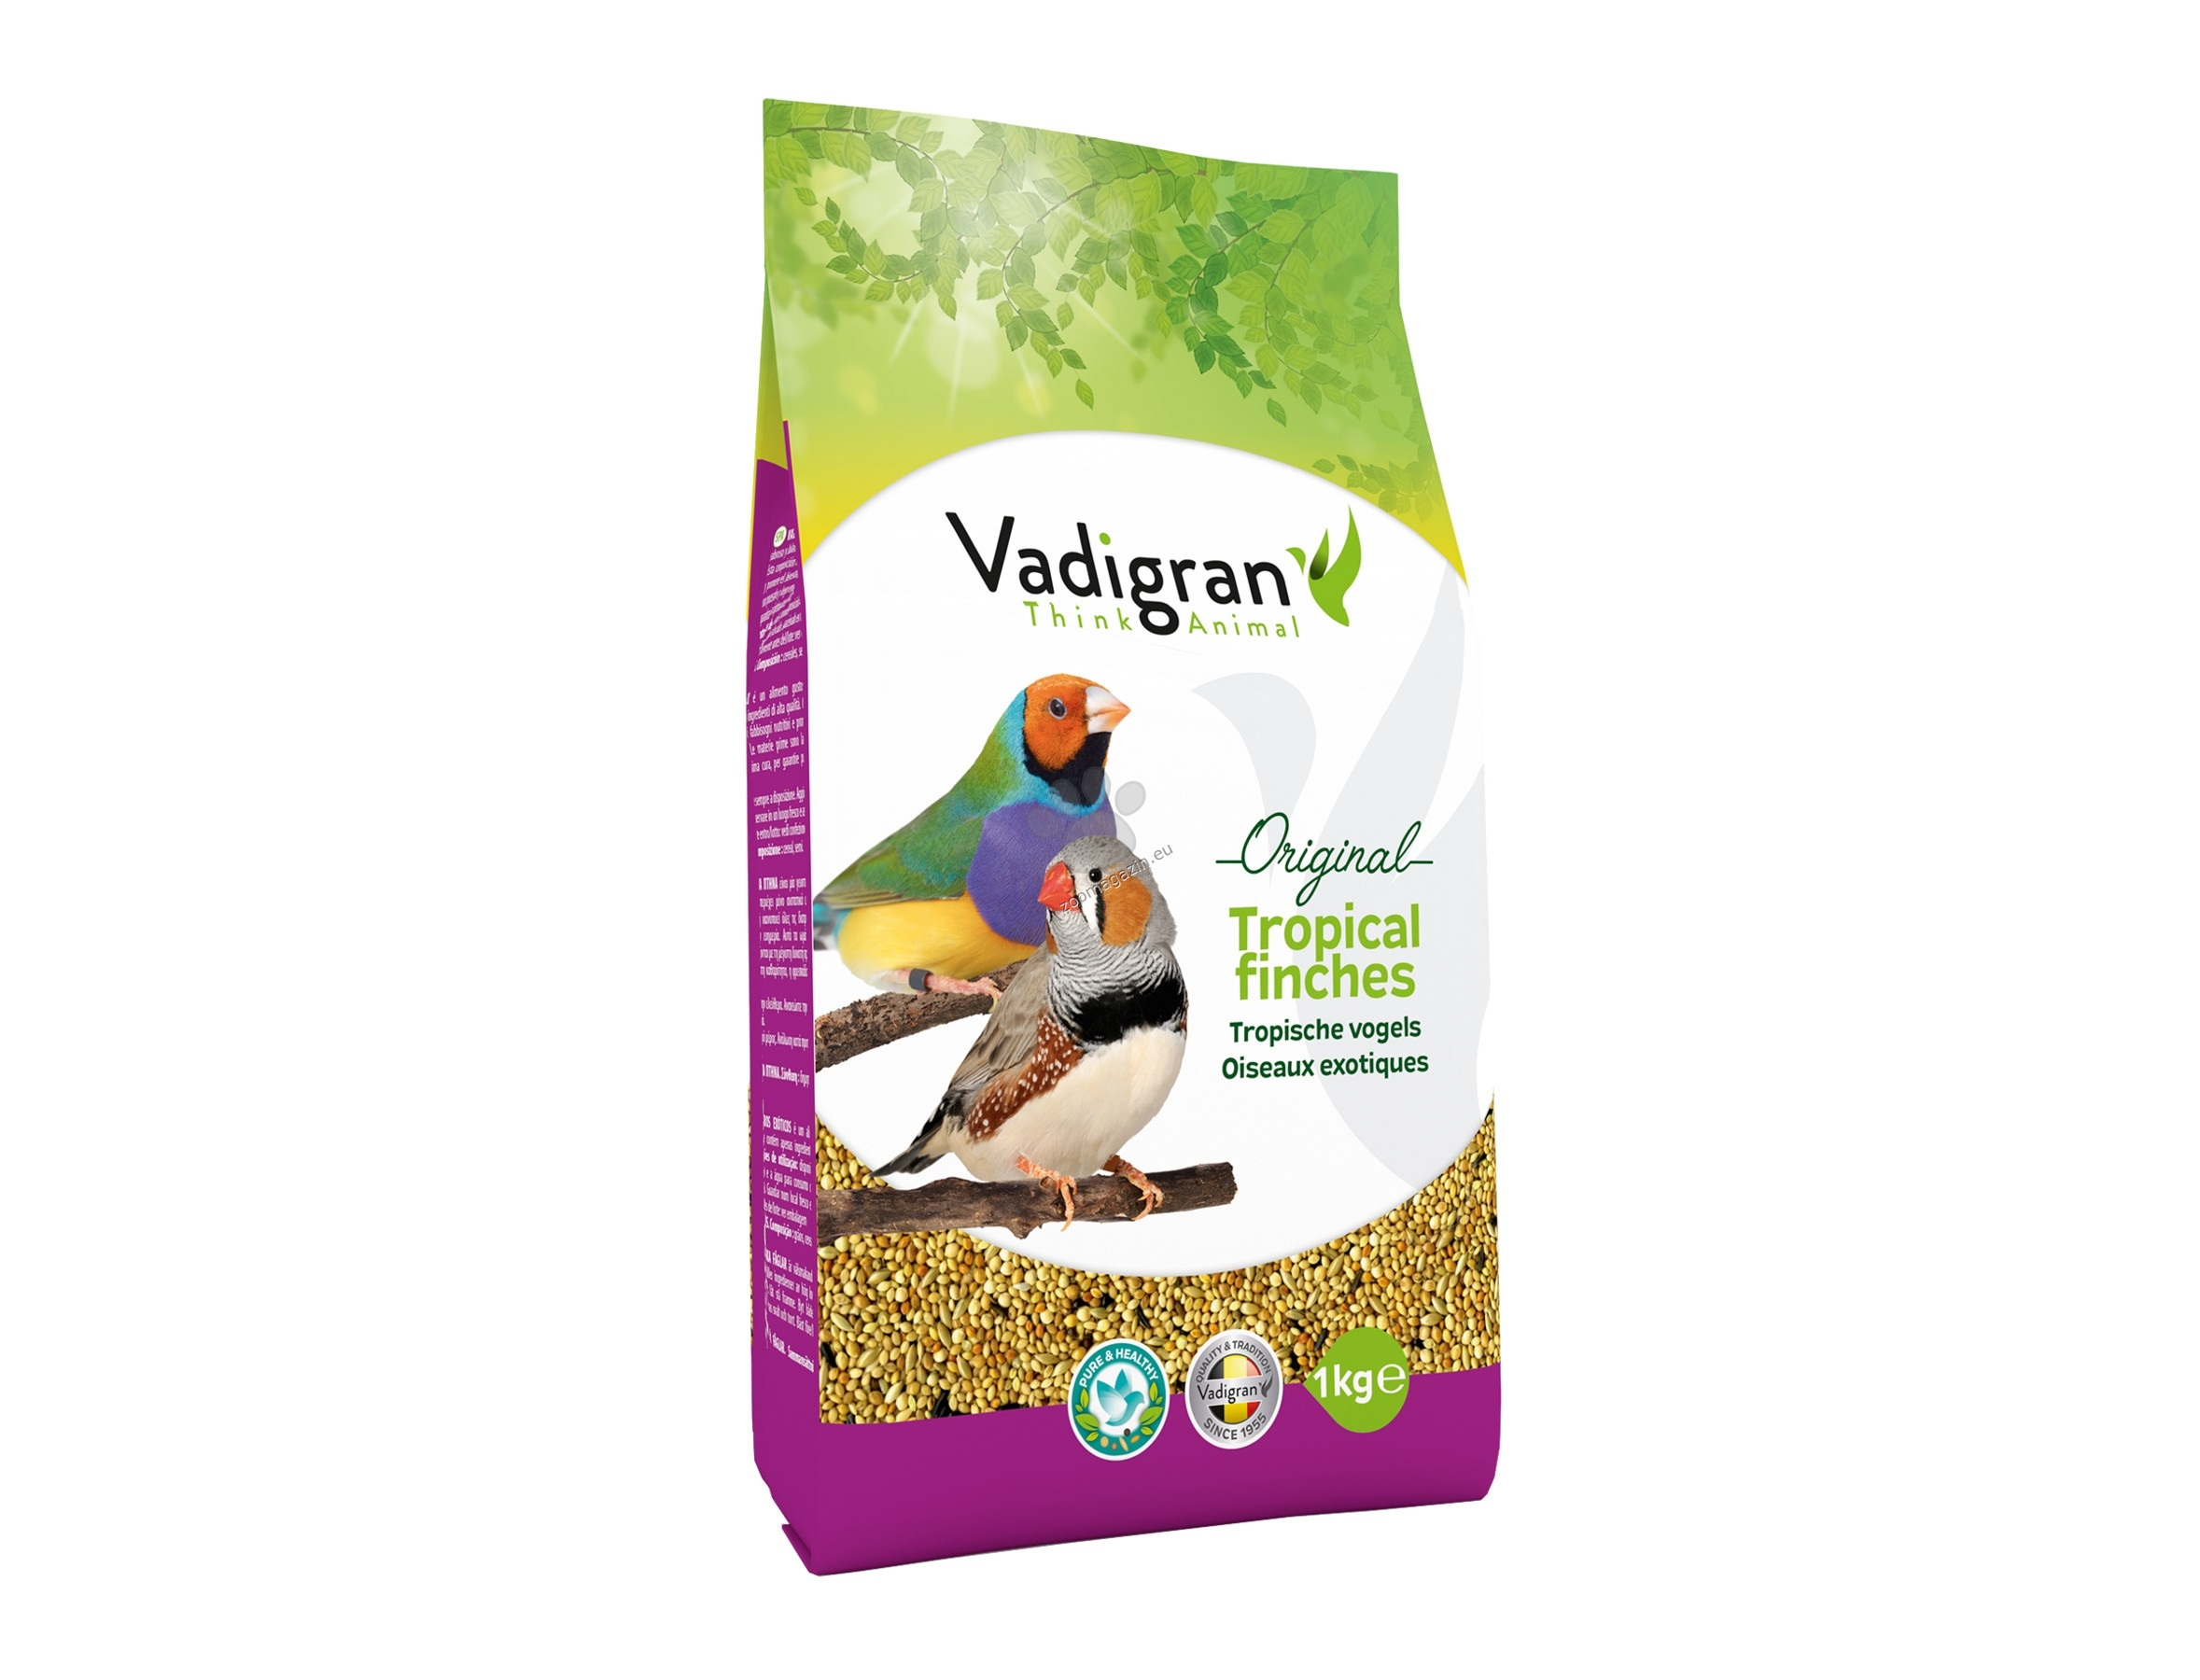 Vadigran - Original Tropical Finches - пълноценна храна за тропически финки 1 кг.